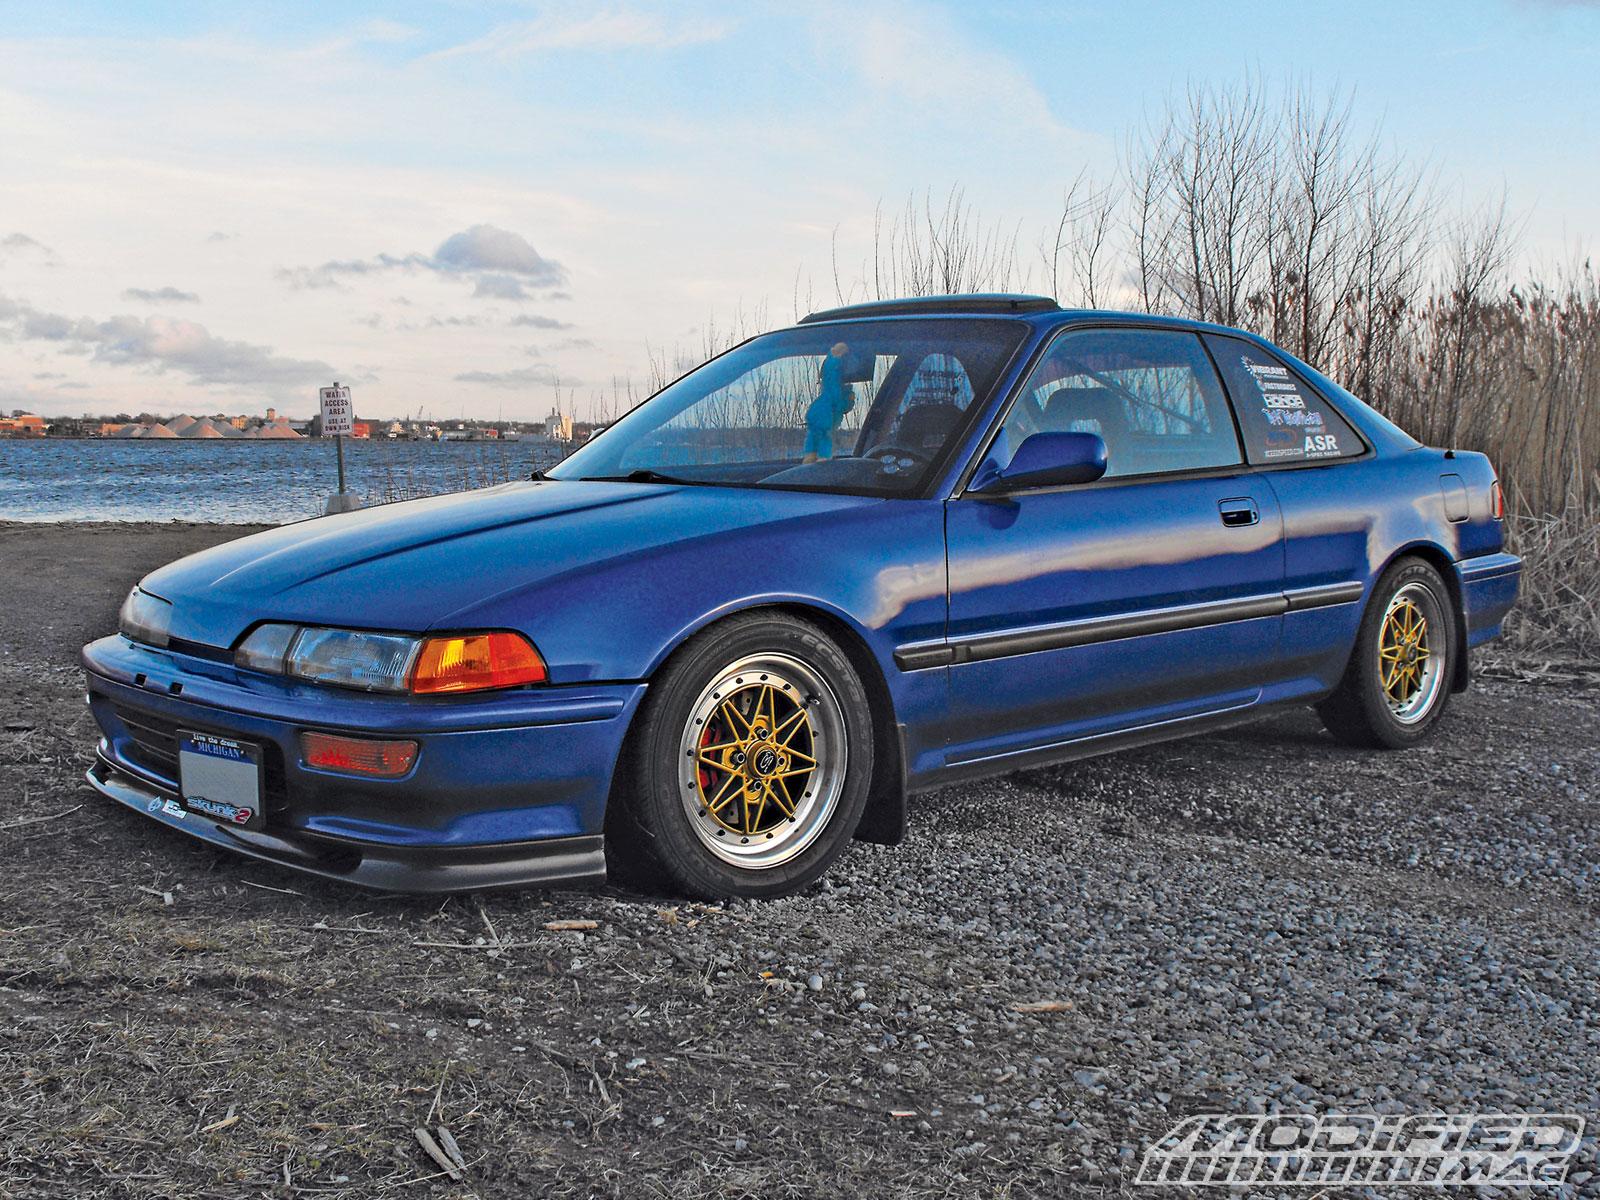 1992 Acura Integra 5